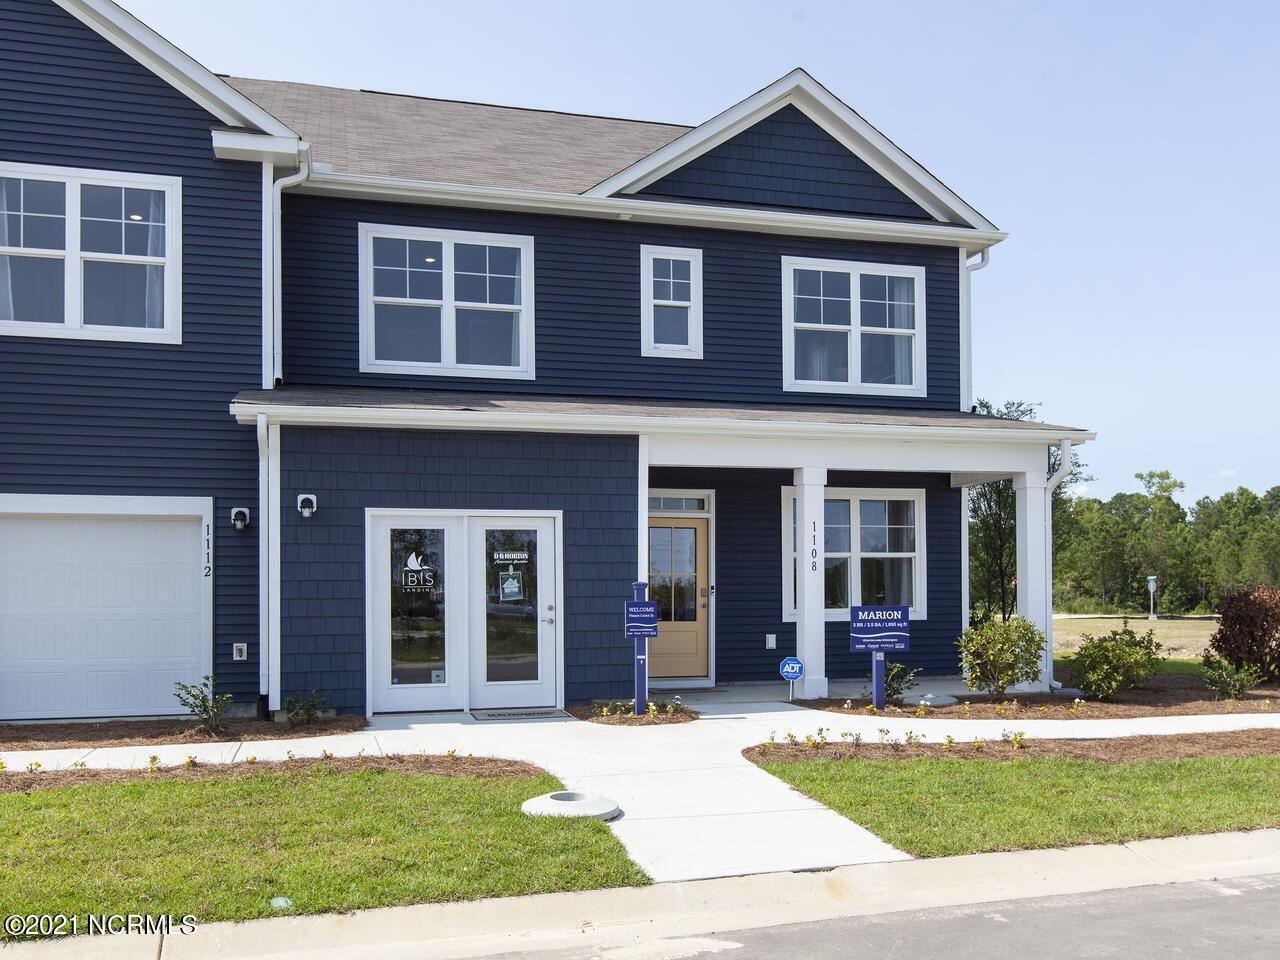 Photo of 7570 Knightbell Circle #Lot 55, Leland, NC 28451 (MLS # 100290092)